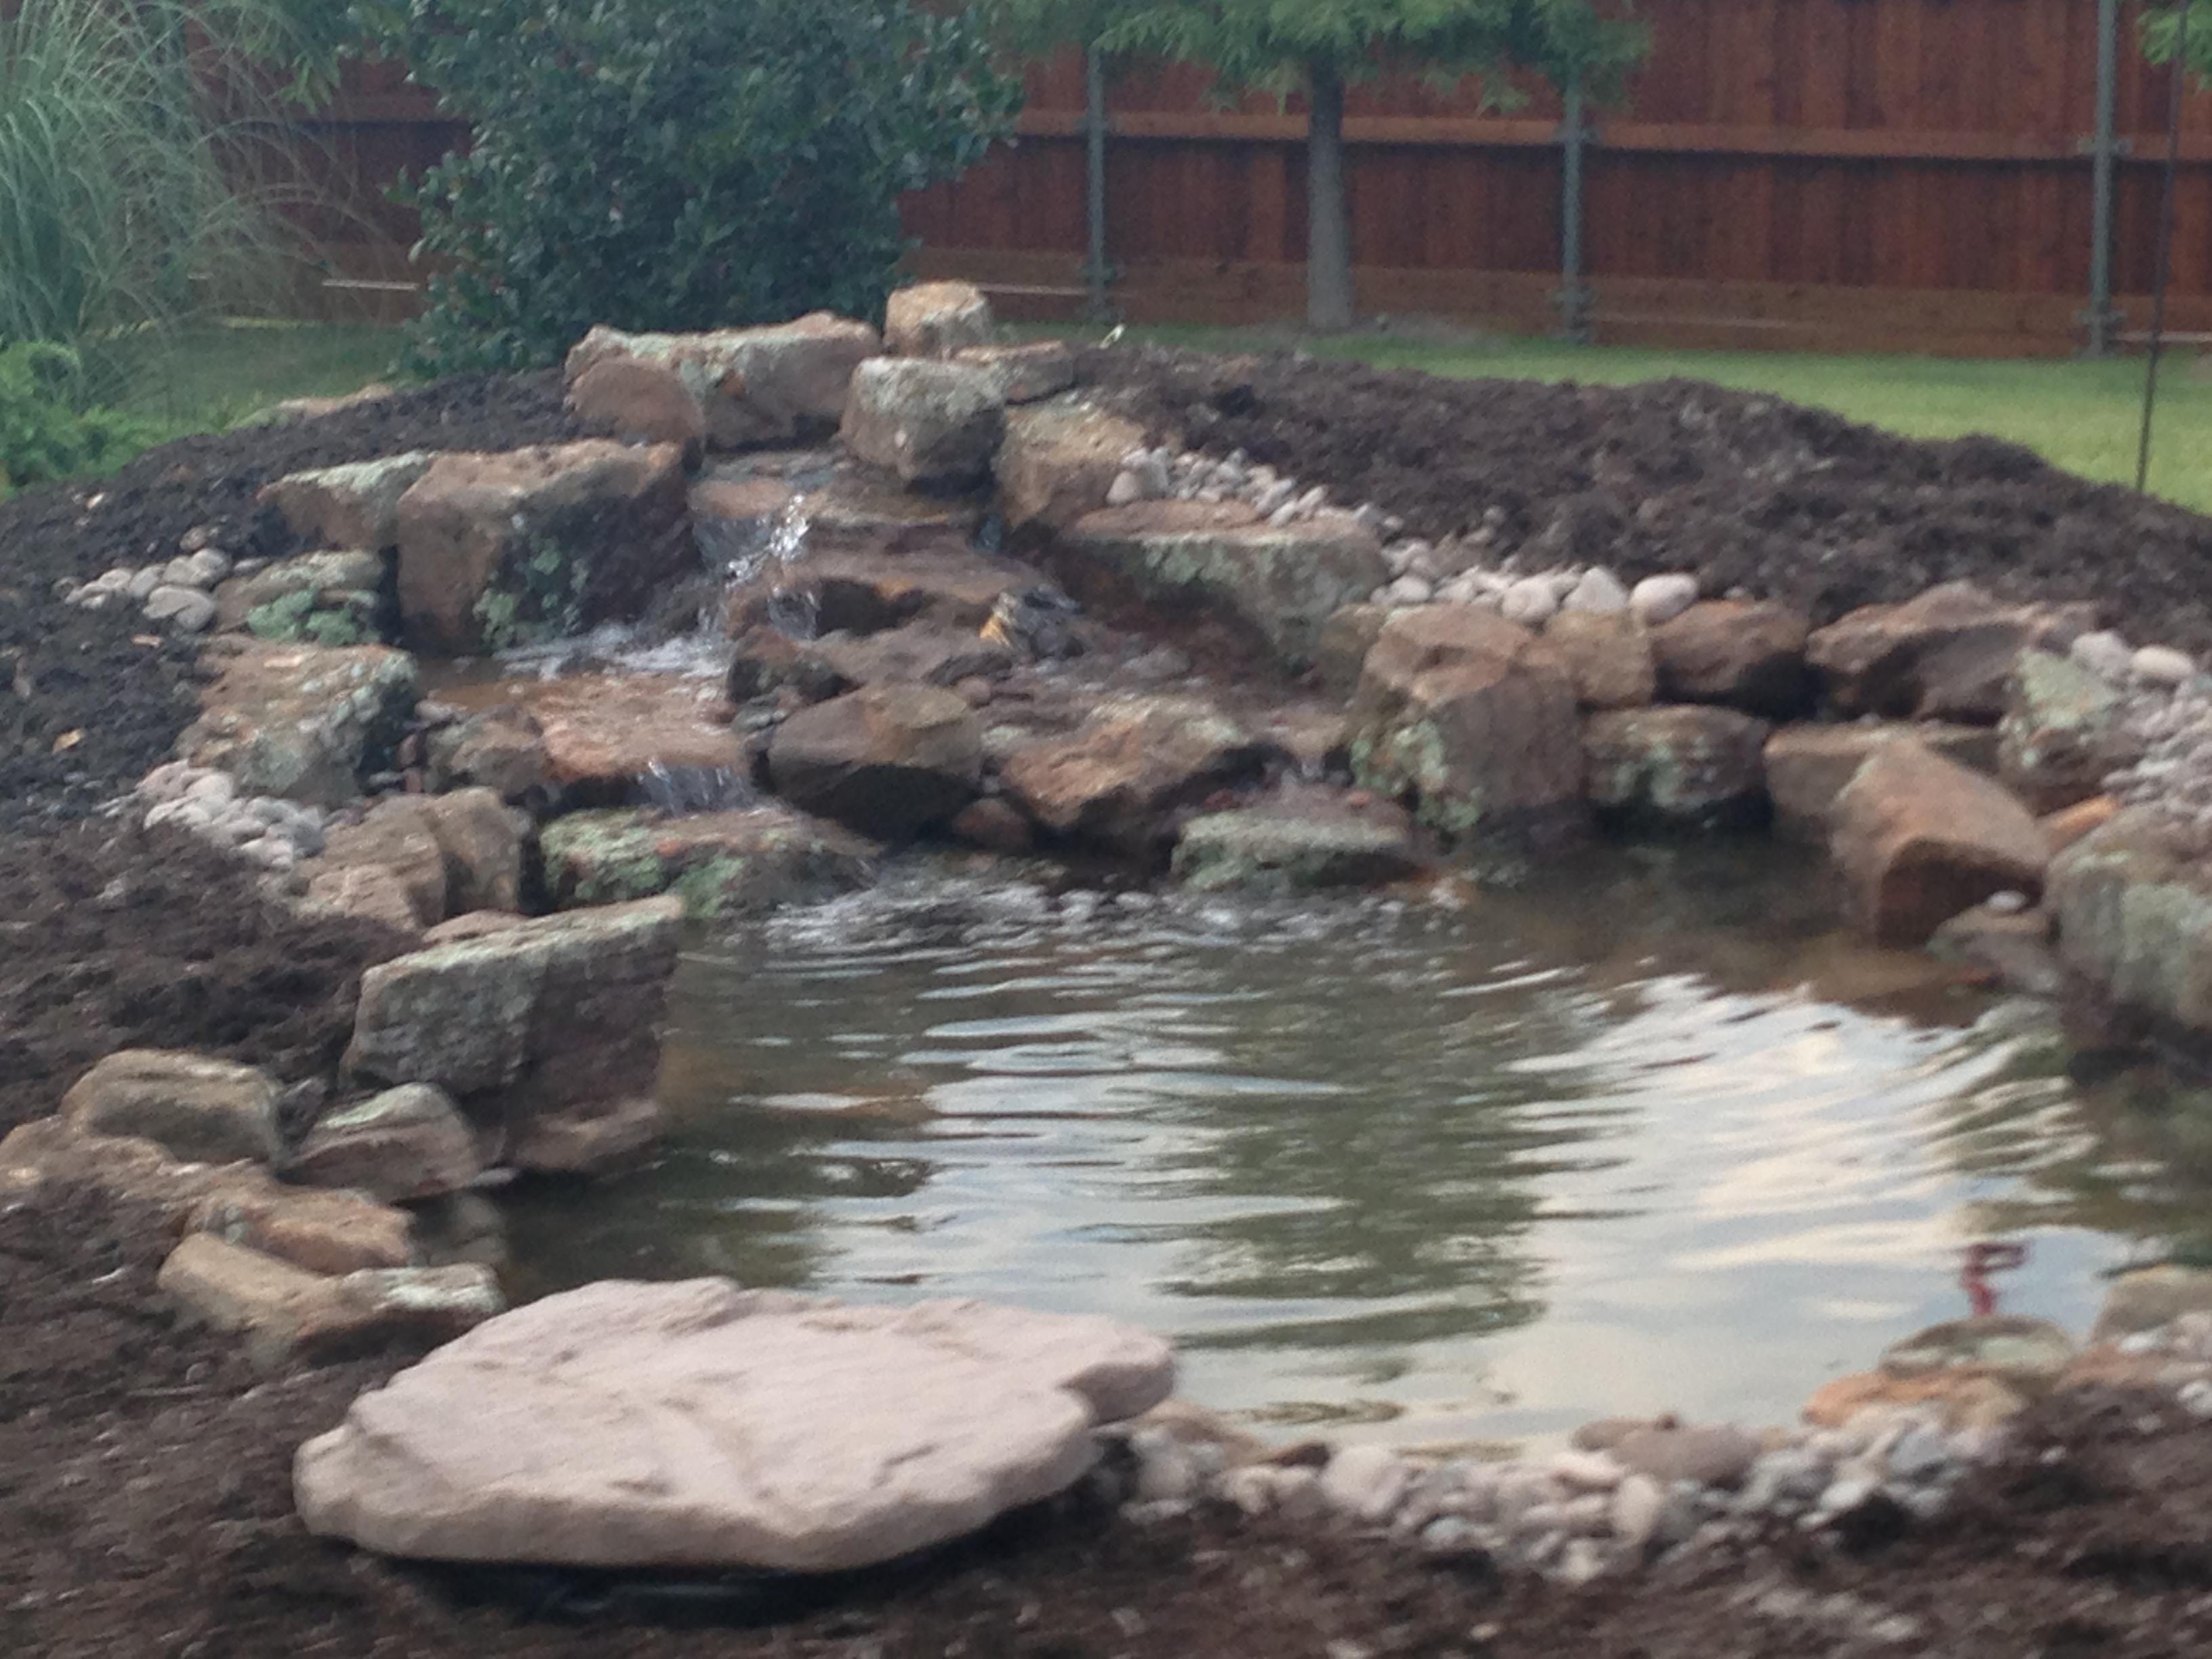 TX-Pond Design|Installation|Maintenance|Decatur|North Texas|Arlington|Fort Worth